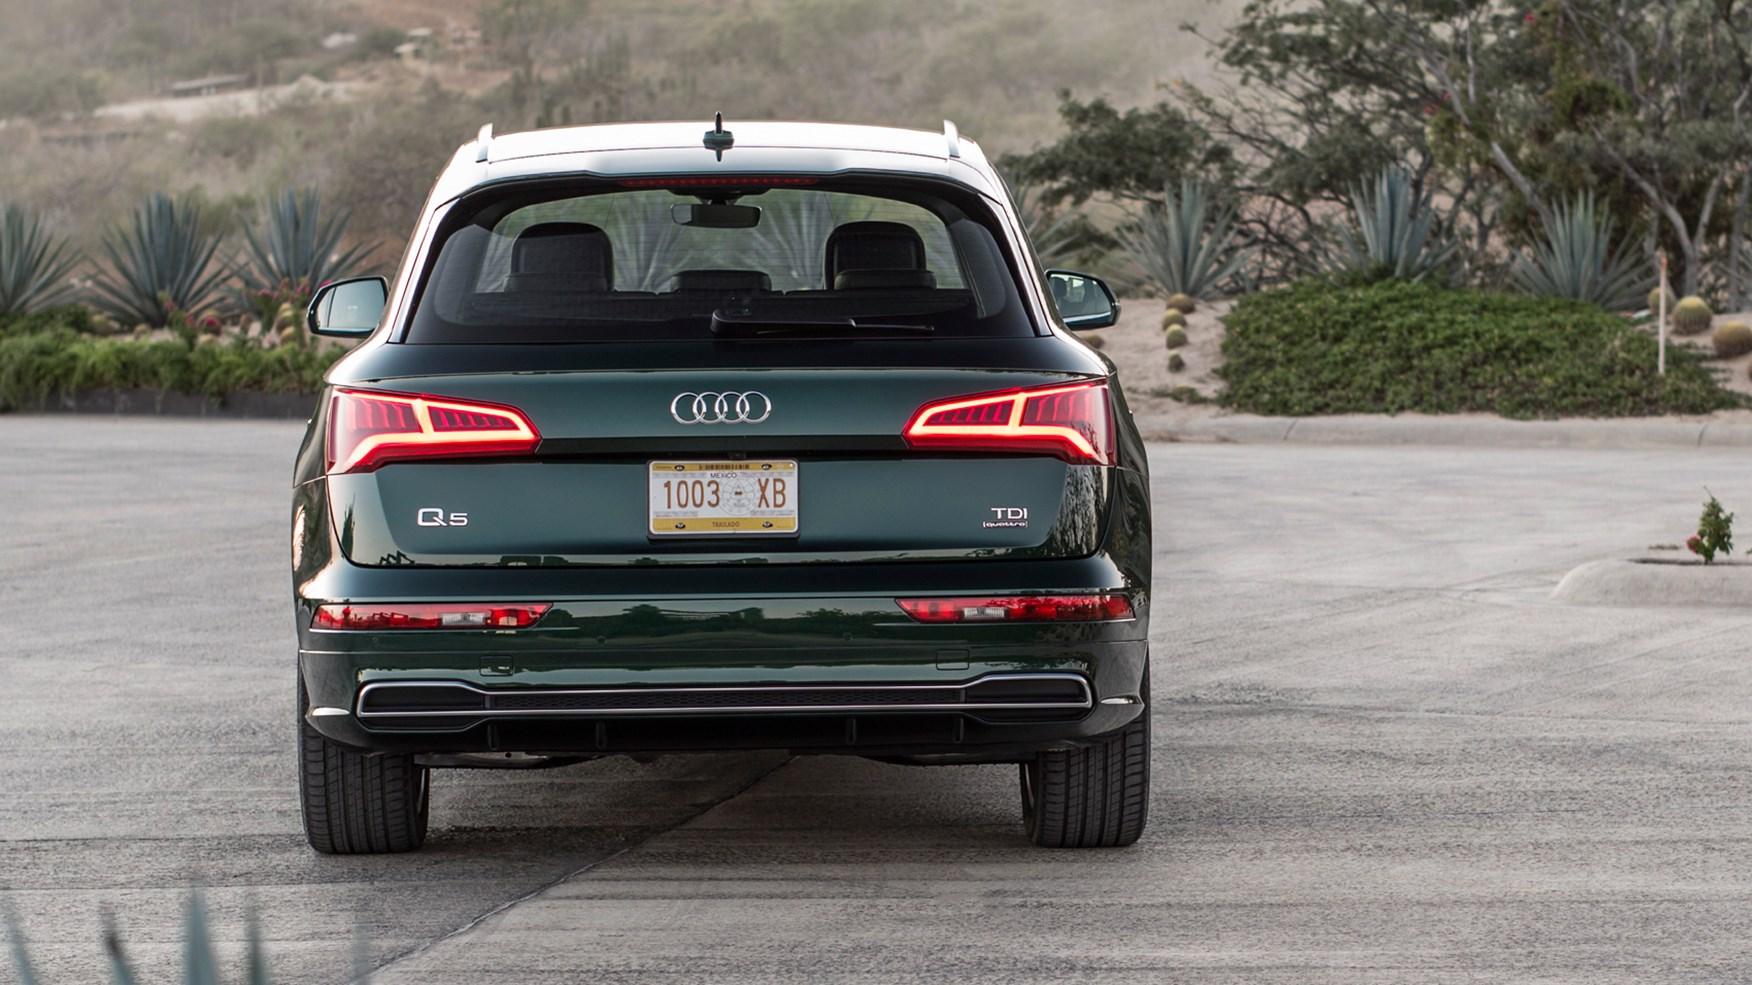 Audi Q5 S Line 2.0 TFSI (2017) review by CAR Magazine